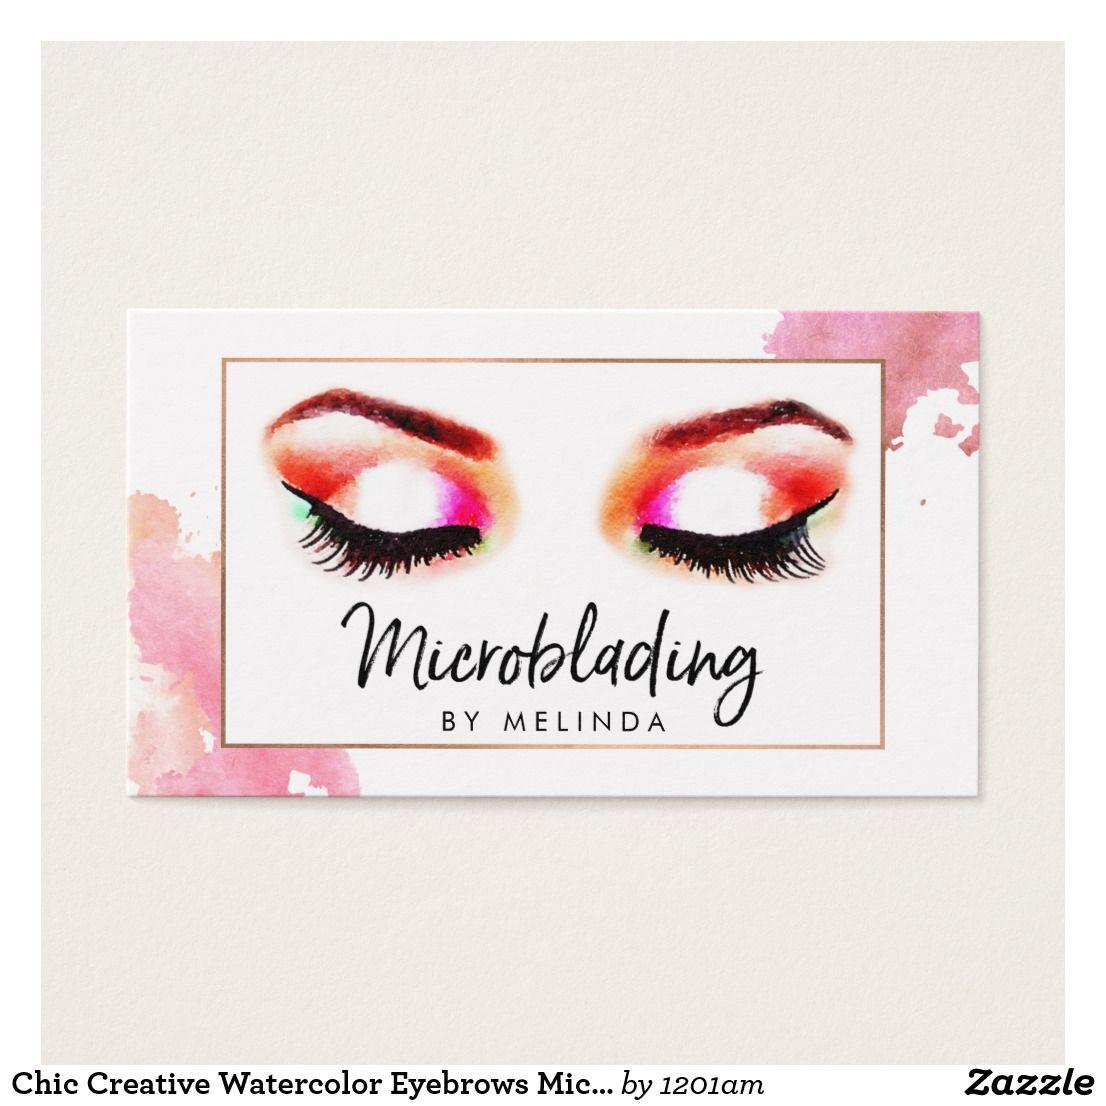 Chic Creative Watercolor Eyebrows Microblading Business Card Carte Visite Sourcils Cartes De Aquarelle